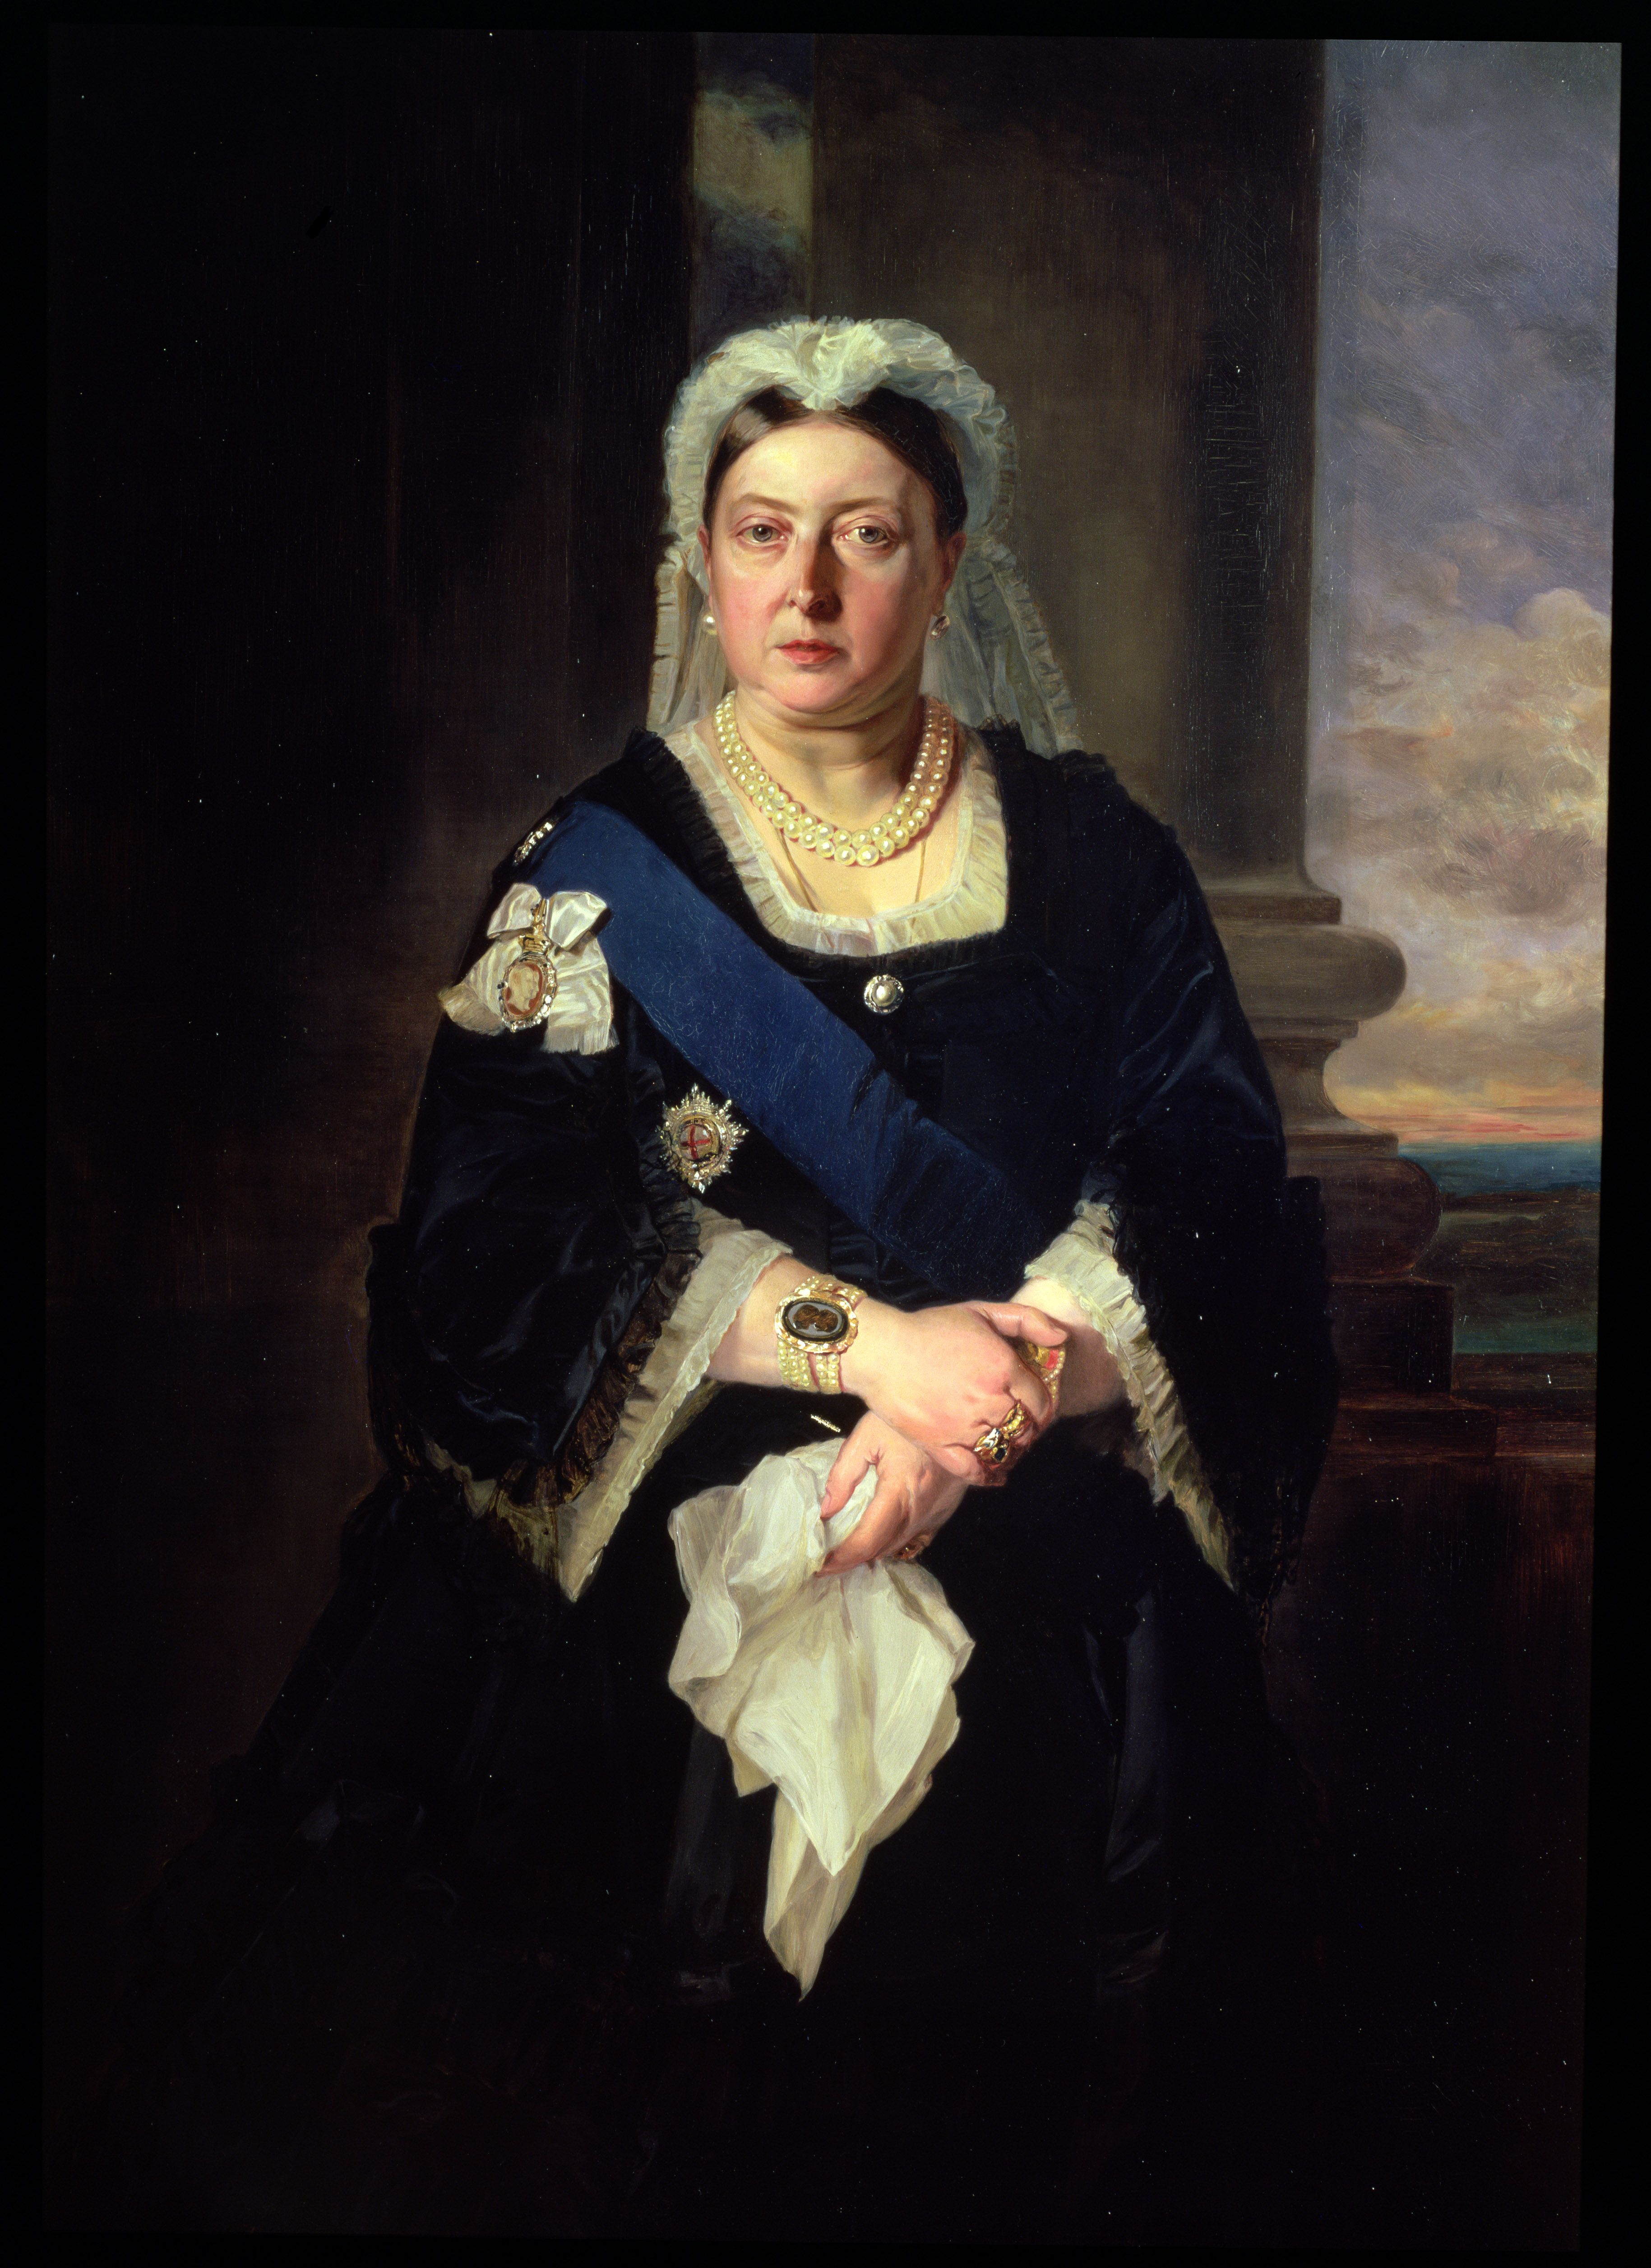 1760 - 1837